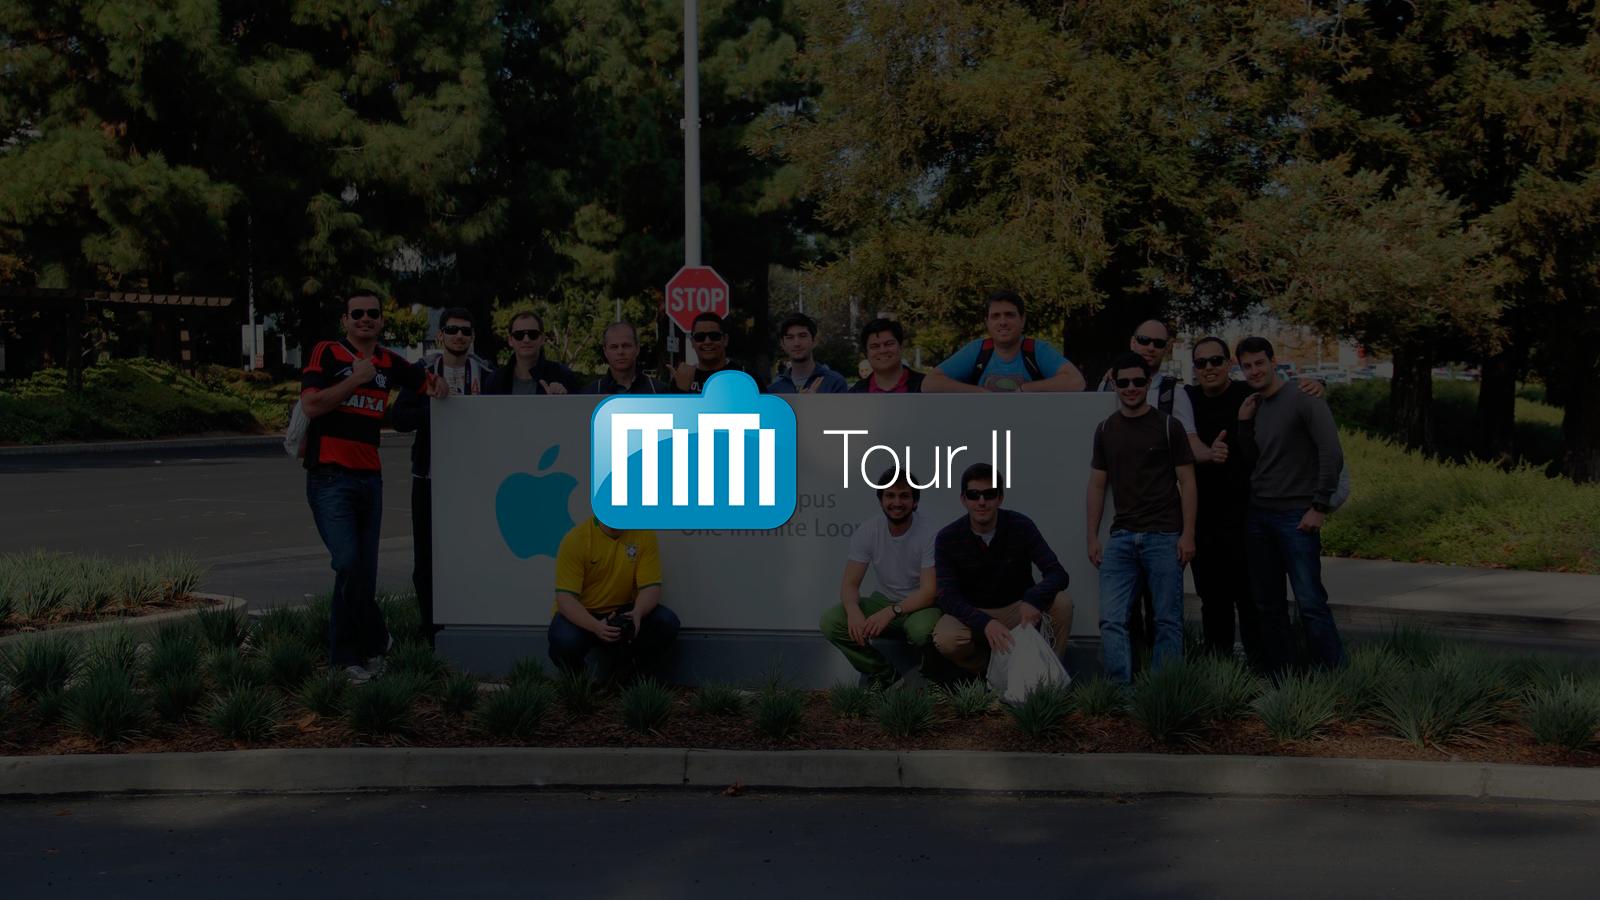 MM Tour II